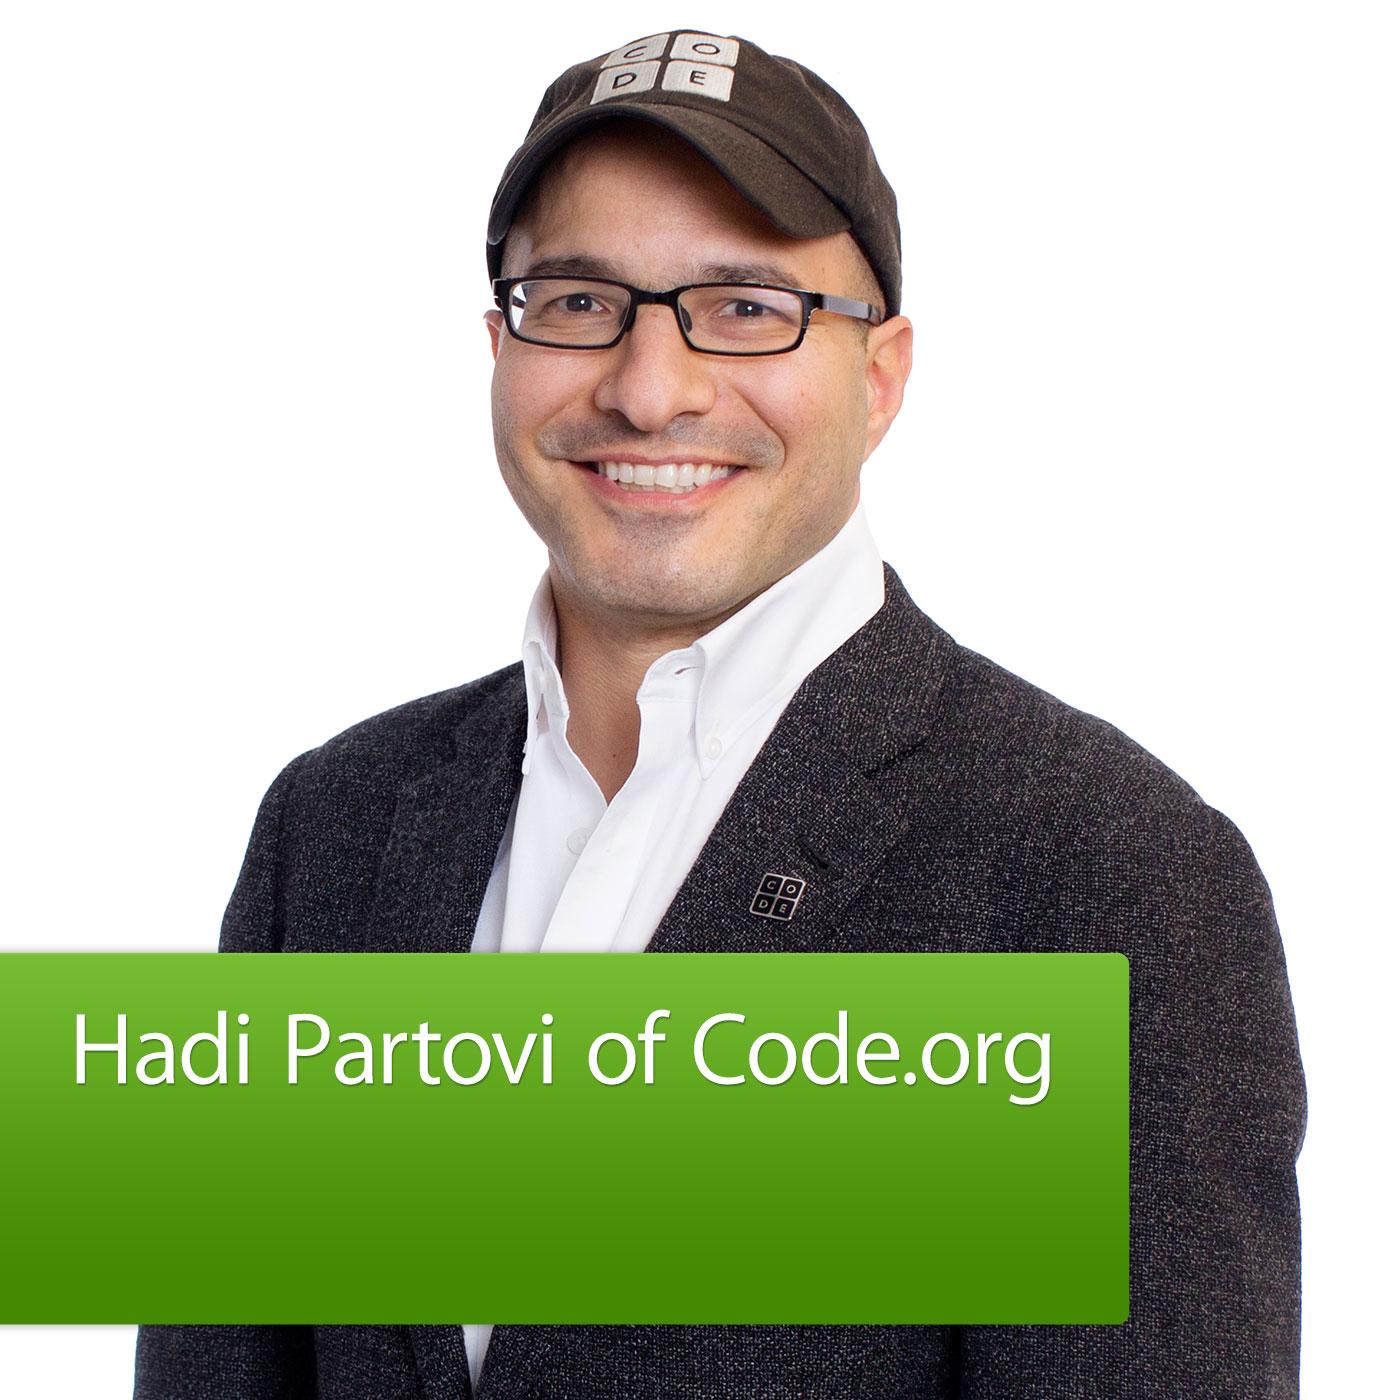 Hadi Partovi of Code.org